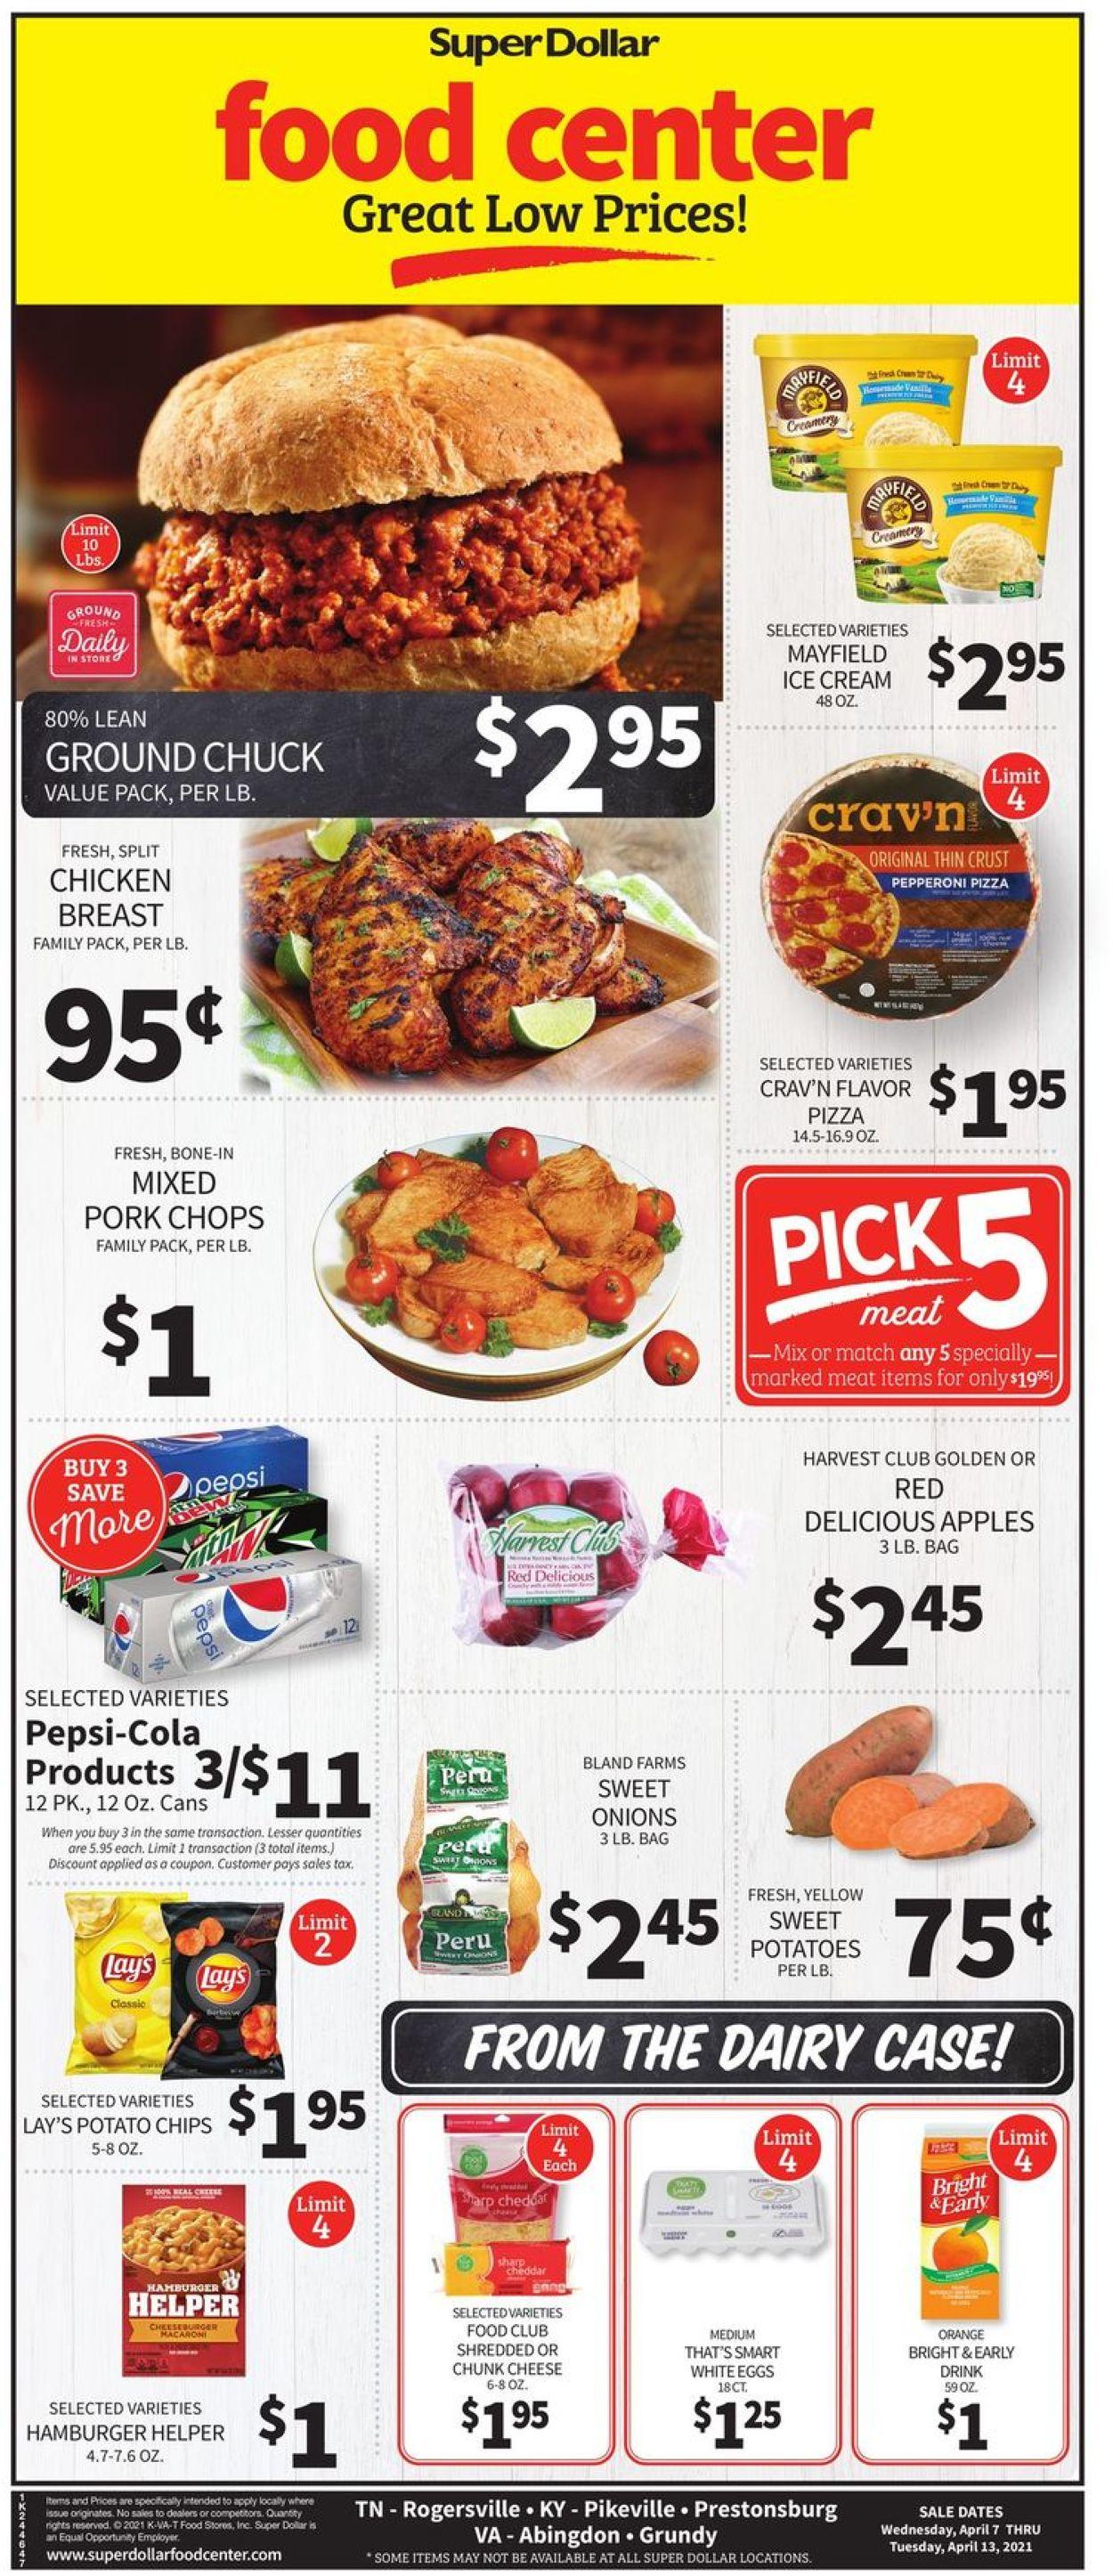 Super Dollar Food Center Weekly Ad Circular - valid 04/07-04/13/2021